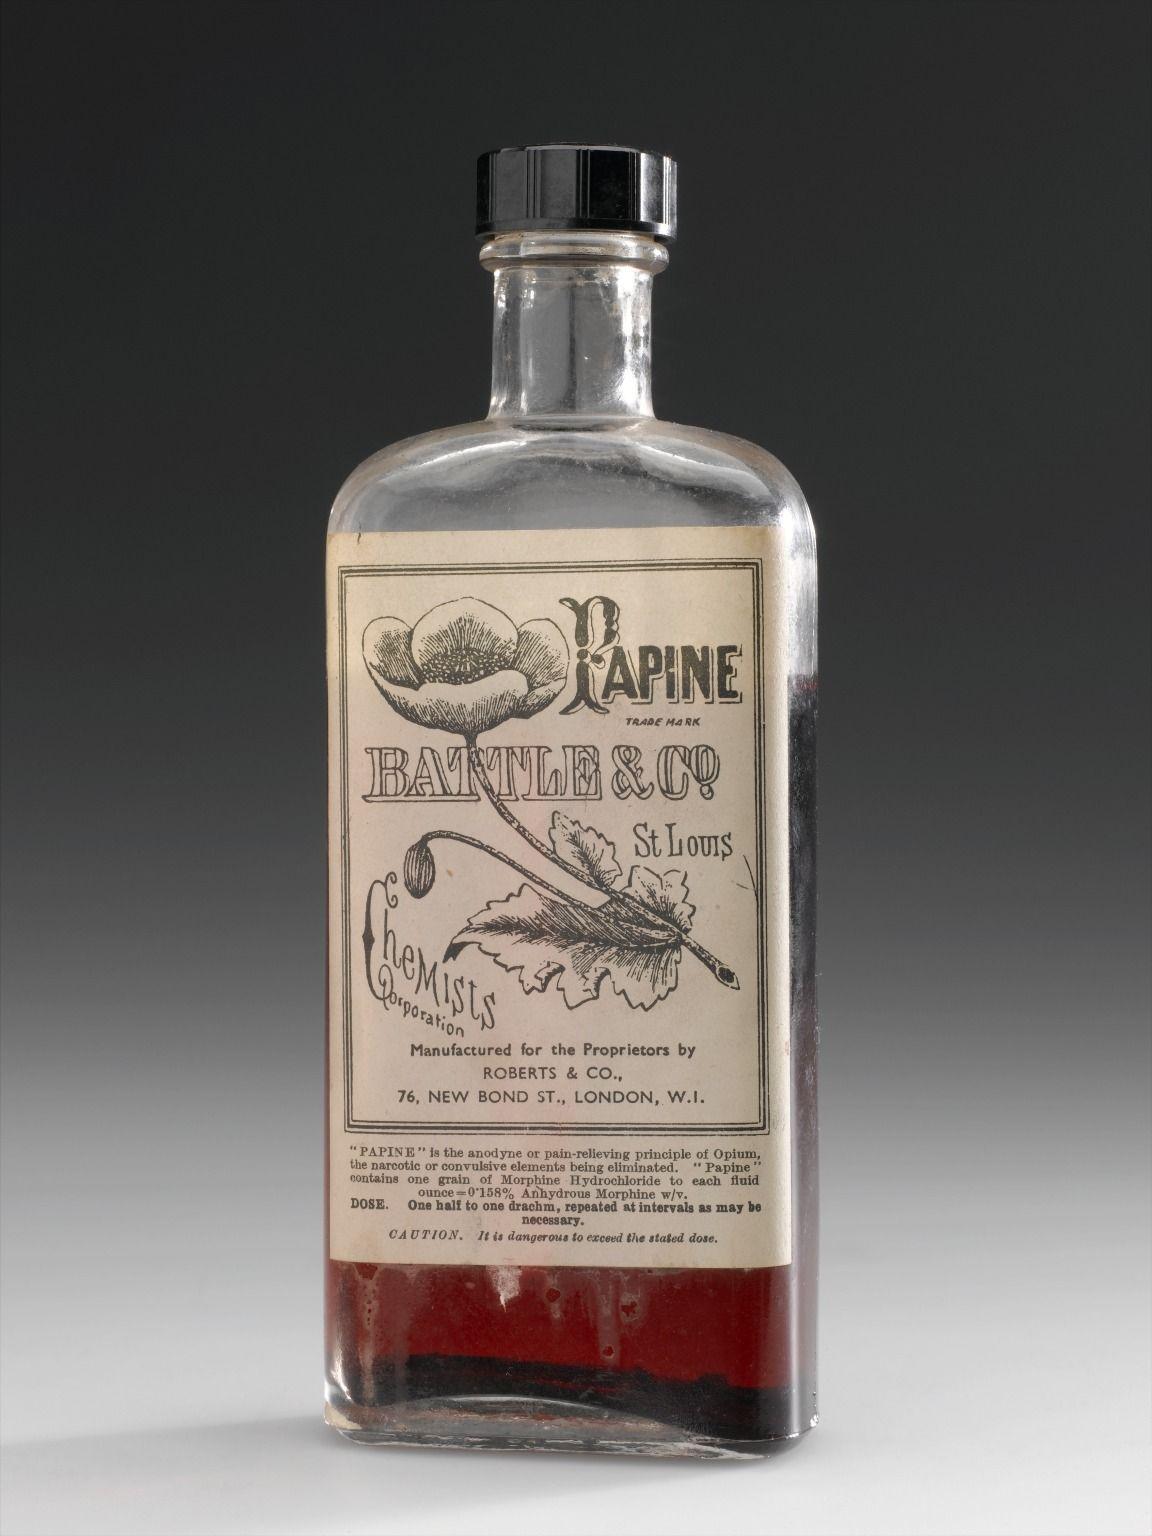 19th century/early 1900s opiate medicine bottle